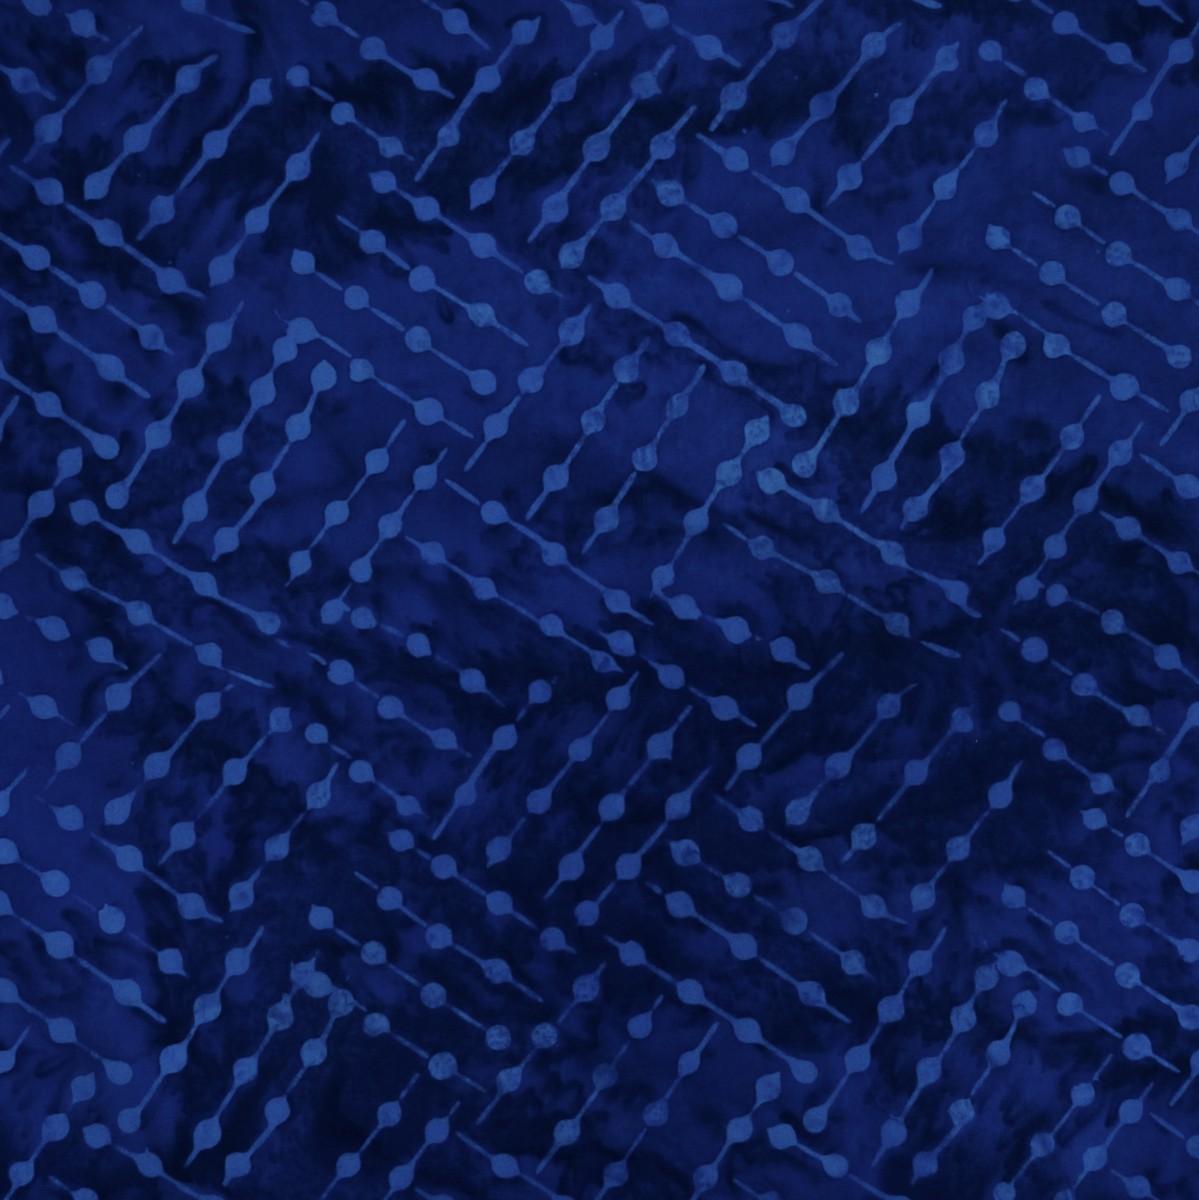 MG-6-9211 Glamour Blue